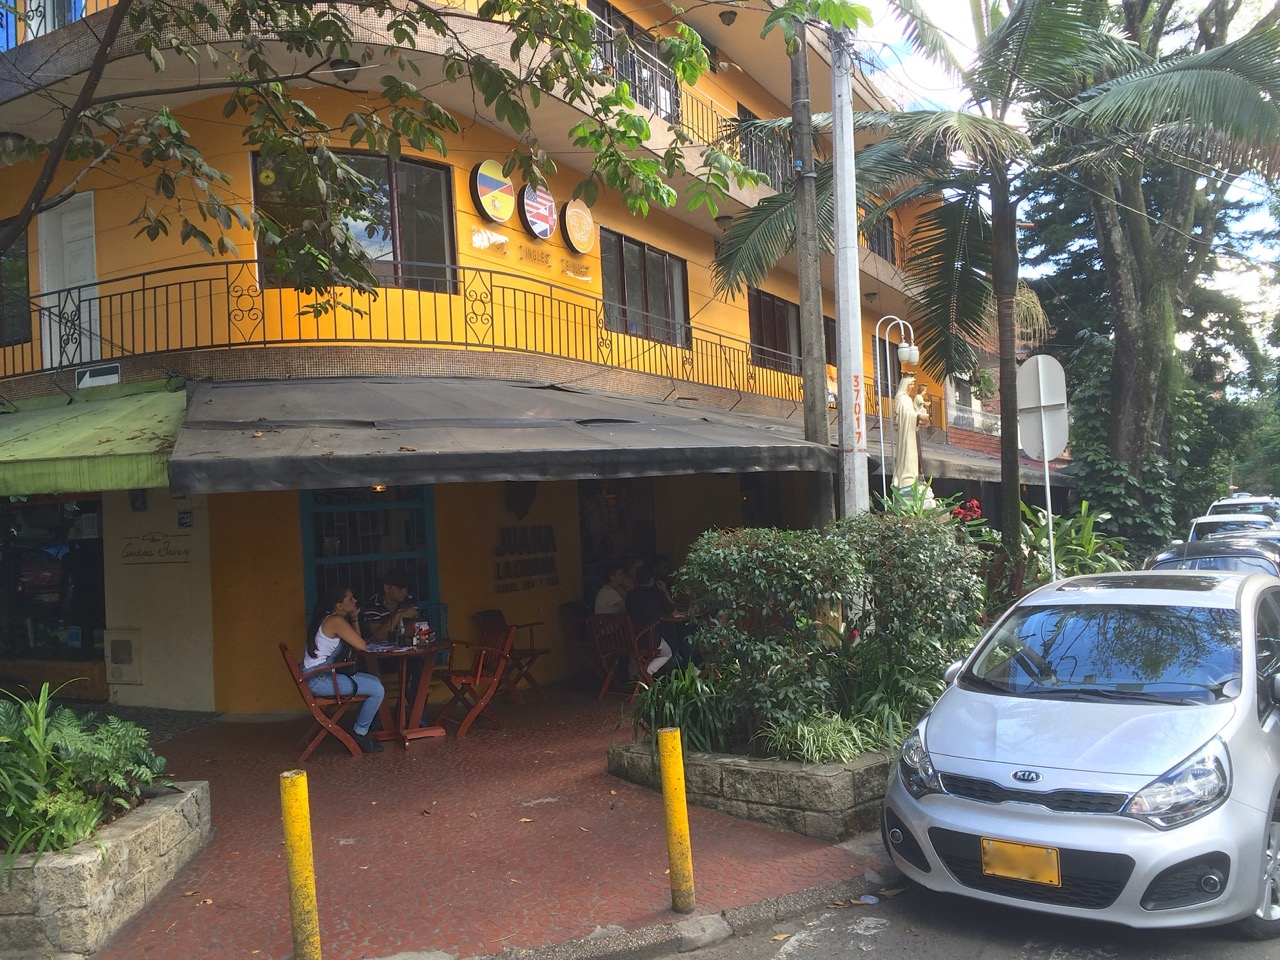 This sunny yellow building houses Juana La Cubana restaurant